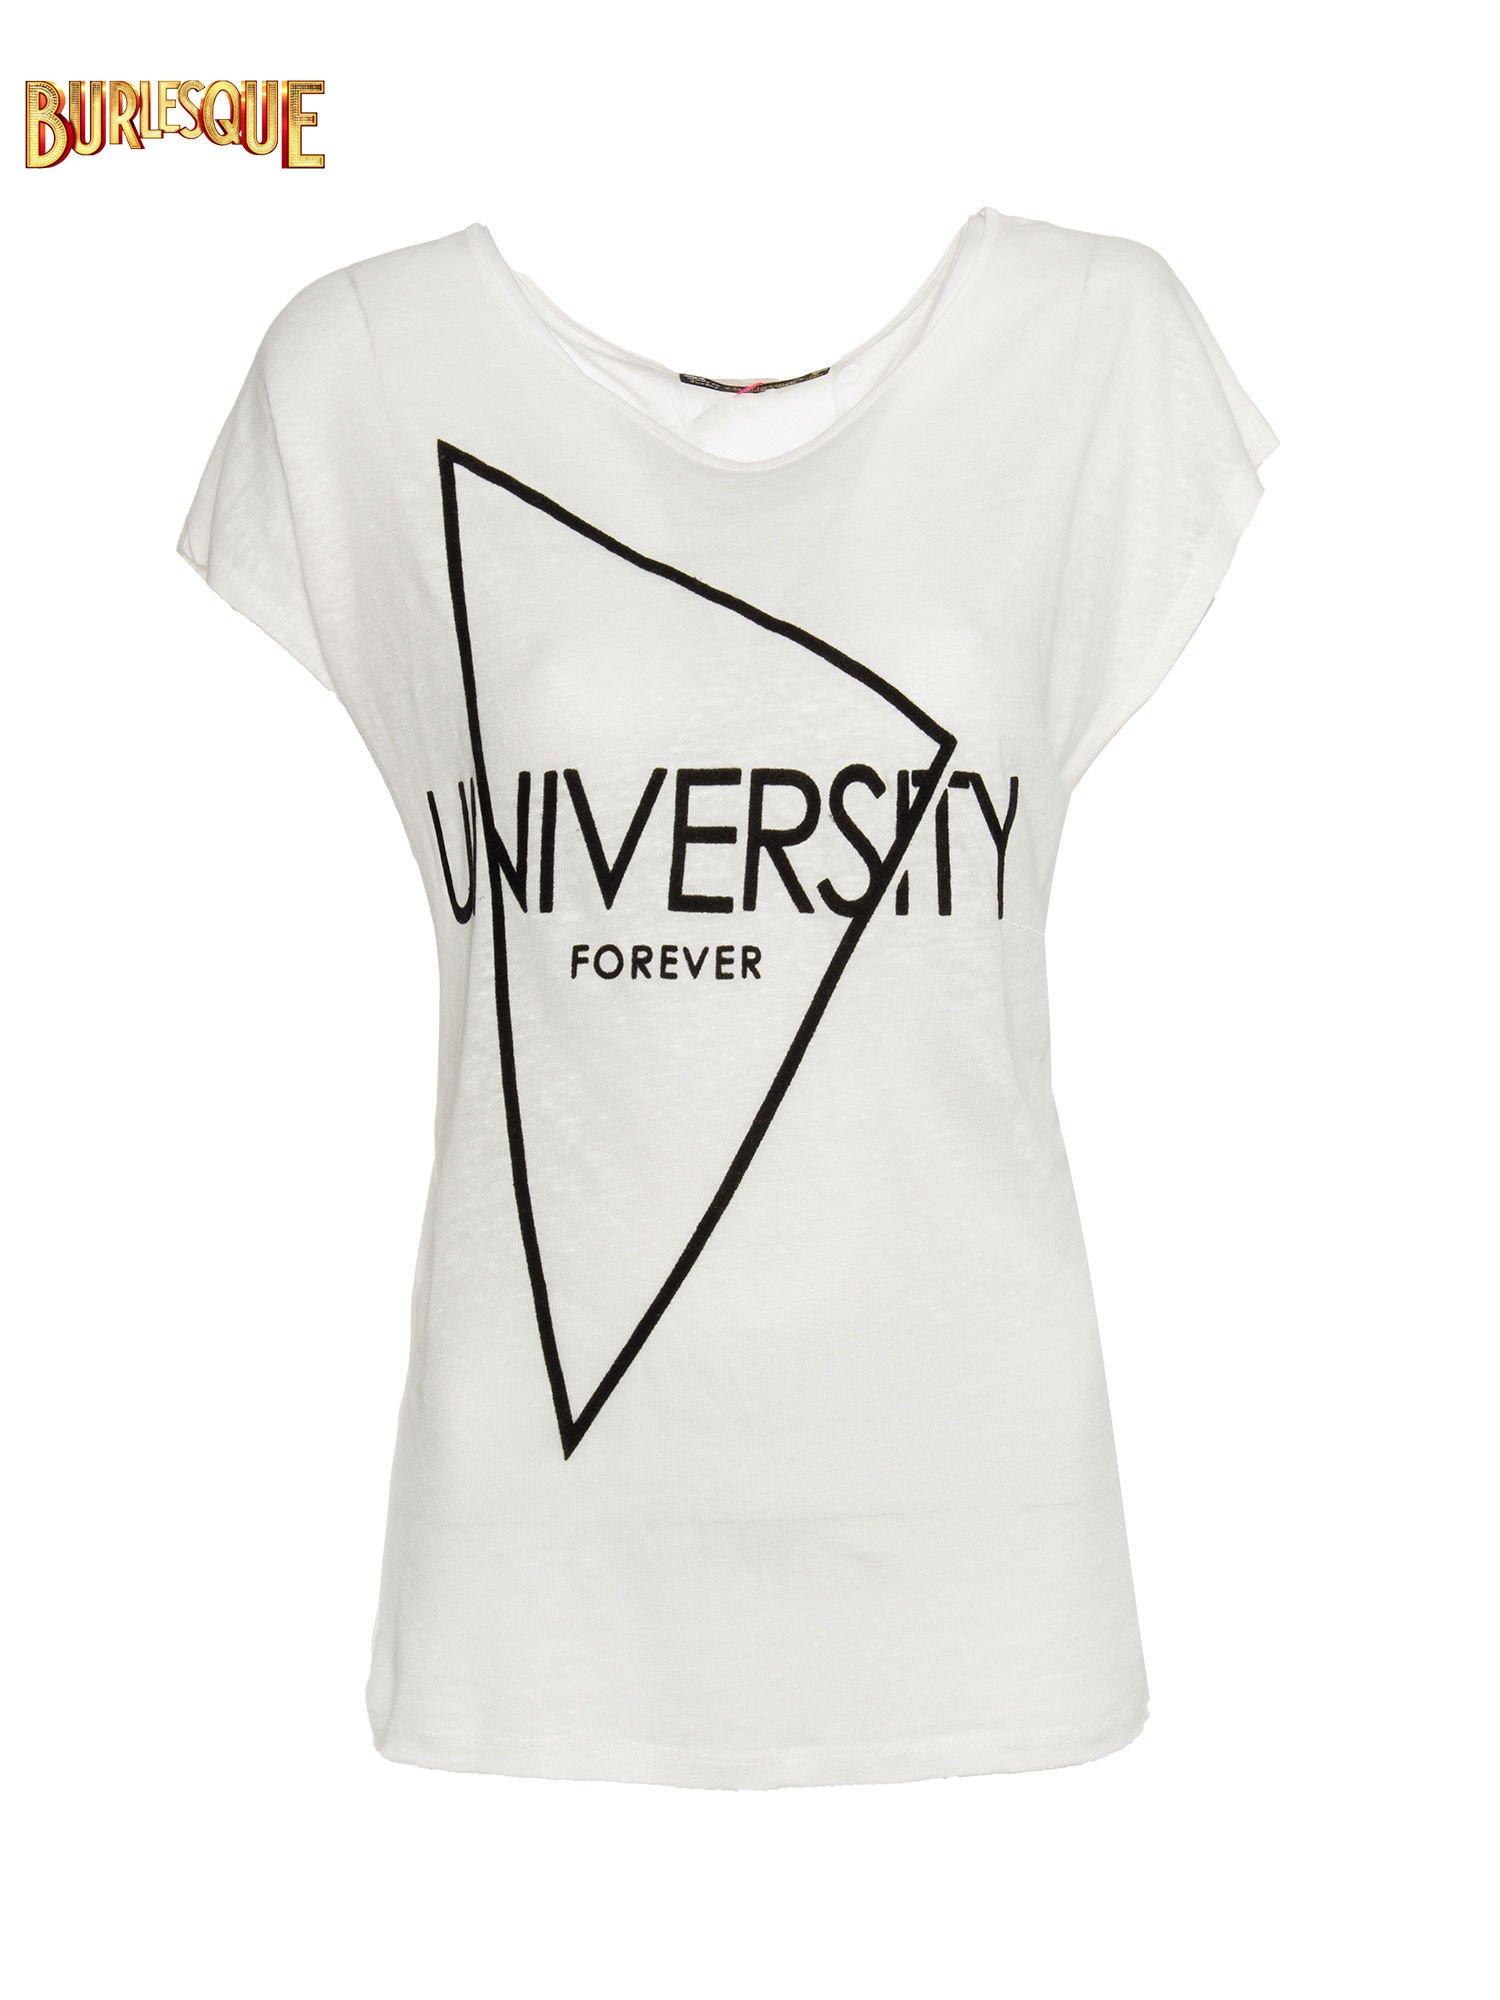 Blady ecru t-shirt z nadrukiem UNIVERSITY FORVER                                  zdj.                                  1